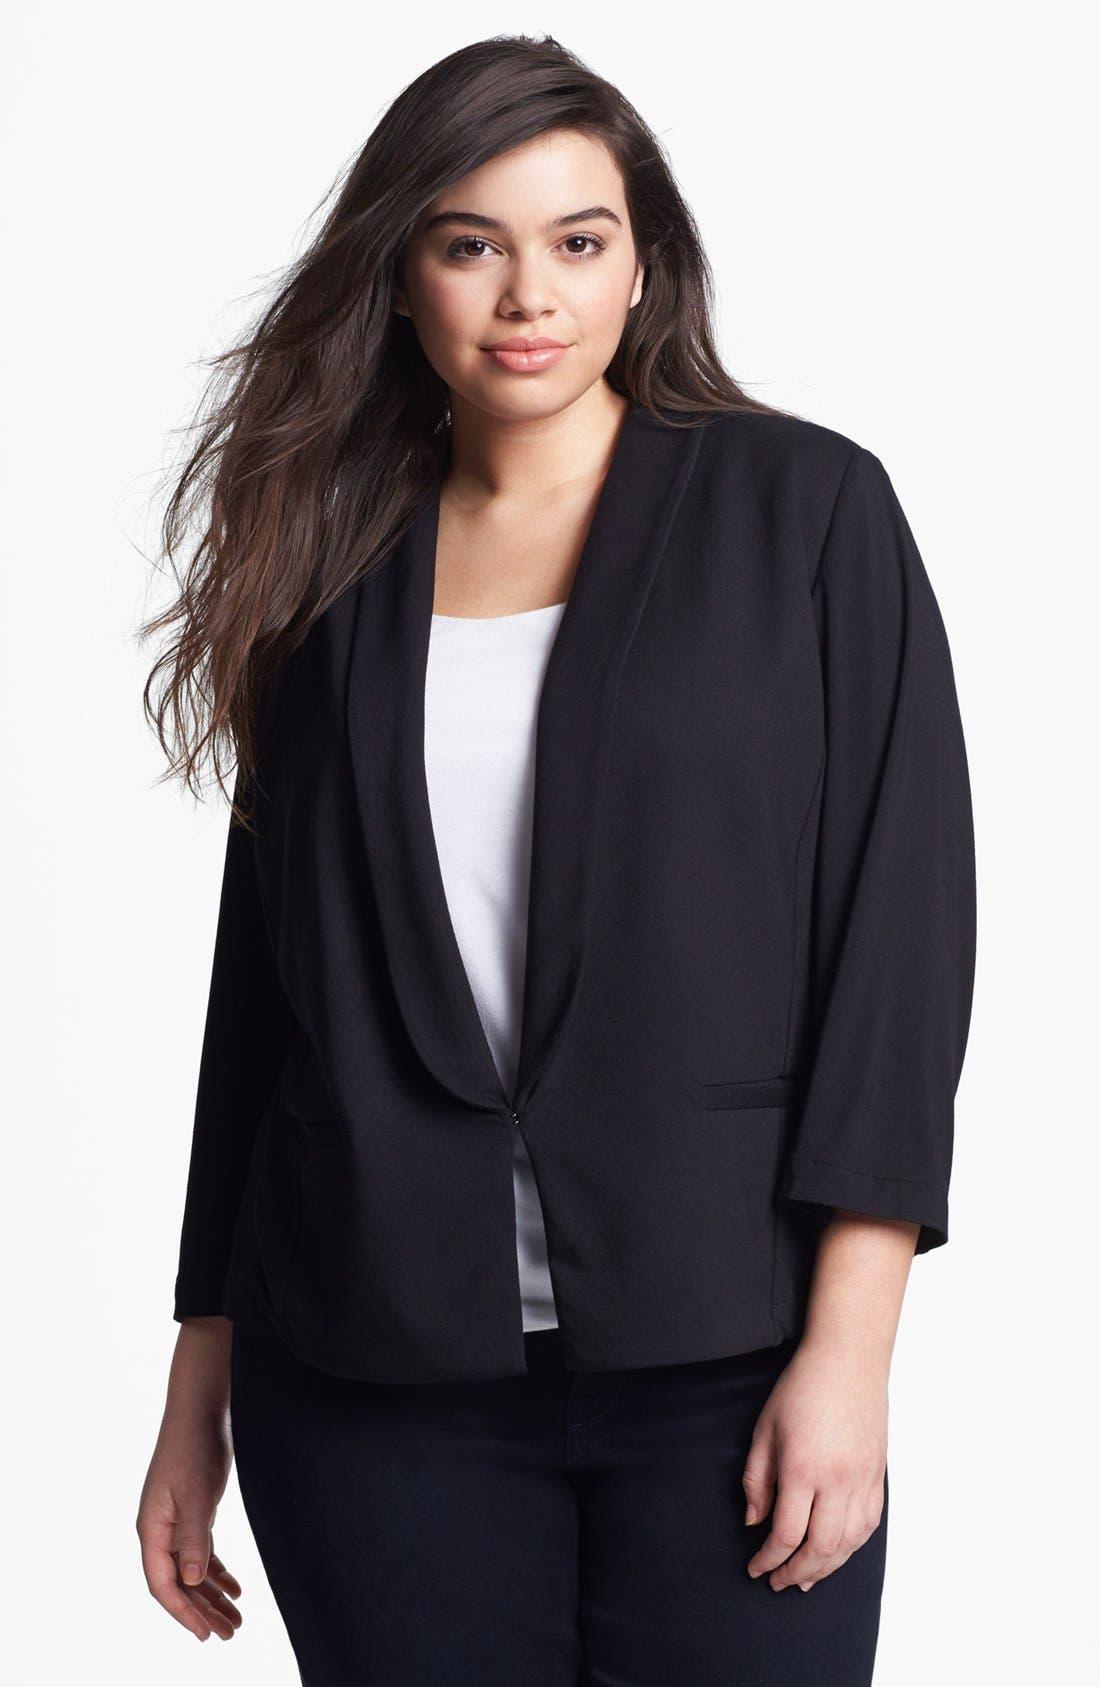 Alternate Image 1 Selected - Sejour 'Siro' Print Shawl Collar Jacket (Plus Size)